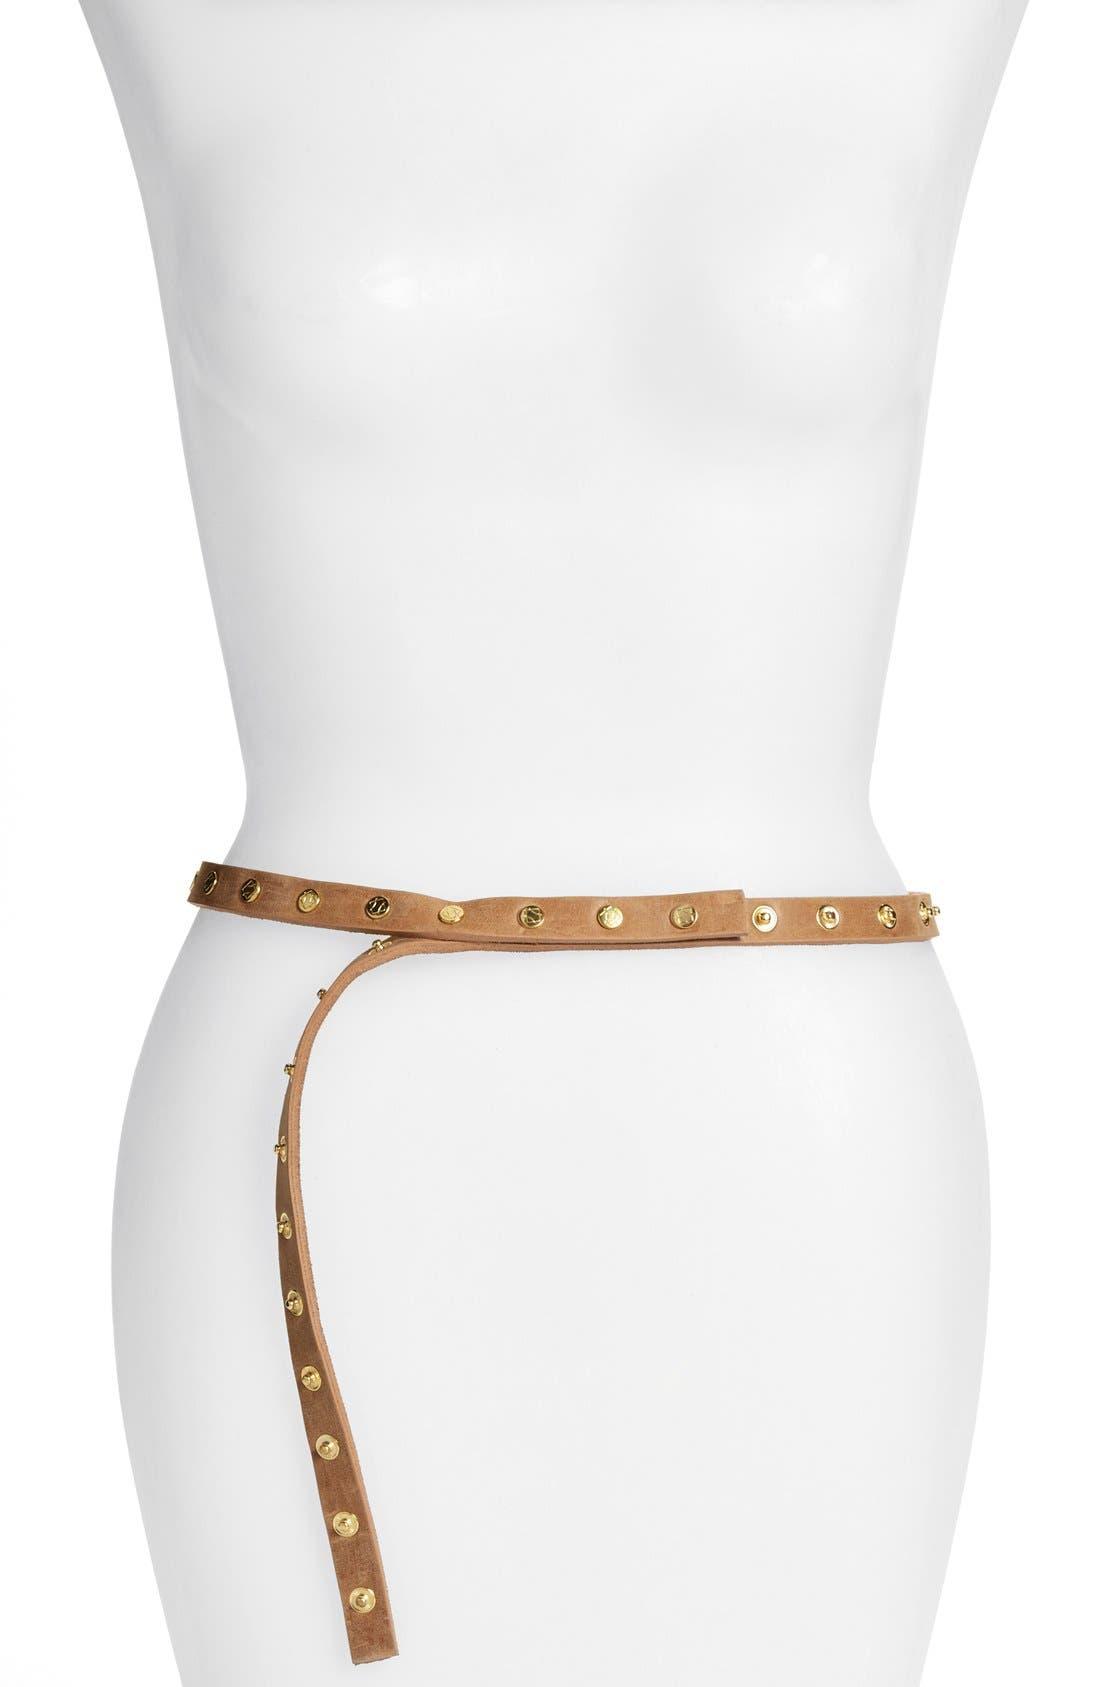 Alternate Image 1 Selected - Ada 'Cala' Studded Skinny Leather Belt